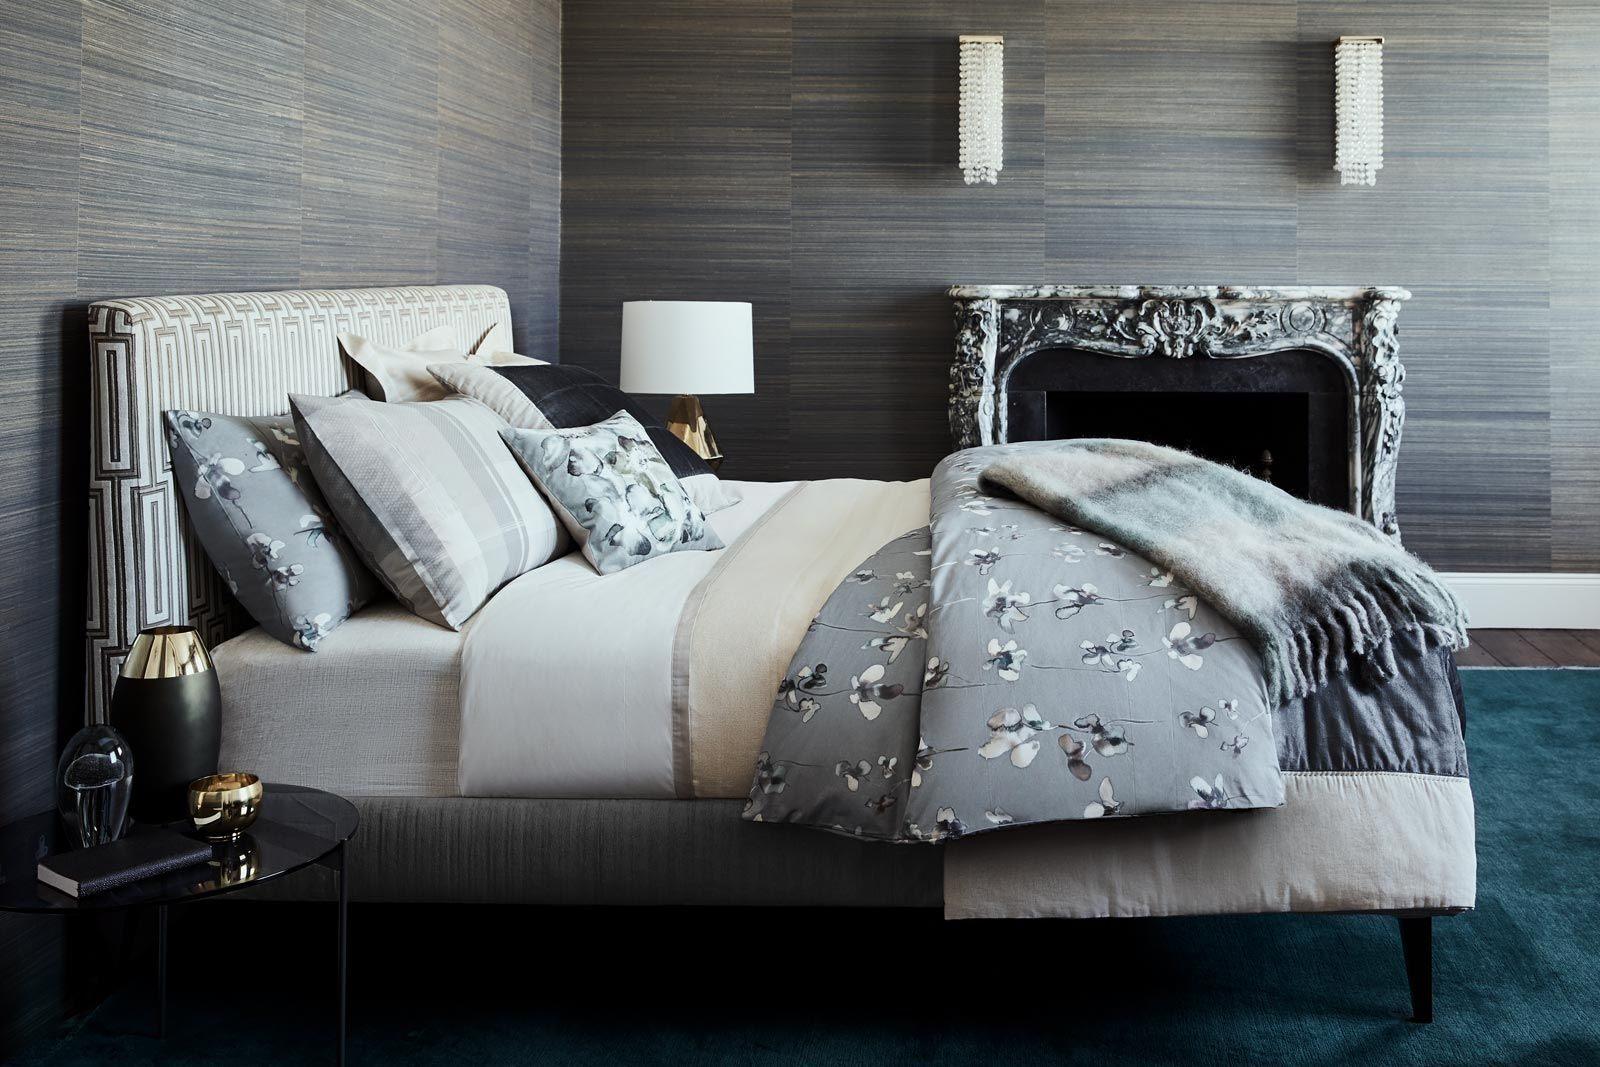 Parure De Lit Zara Home De Luxe Zara Home Bedtime